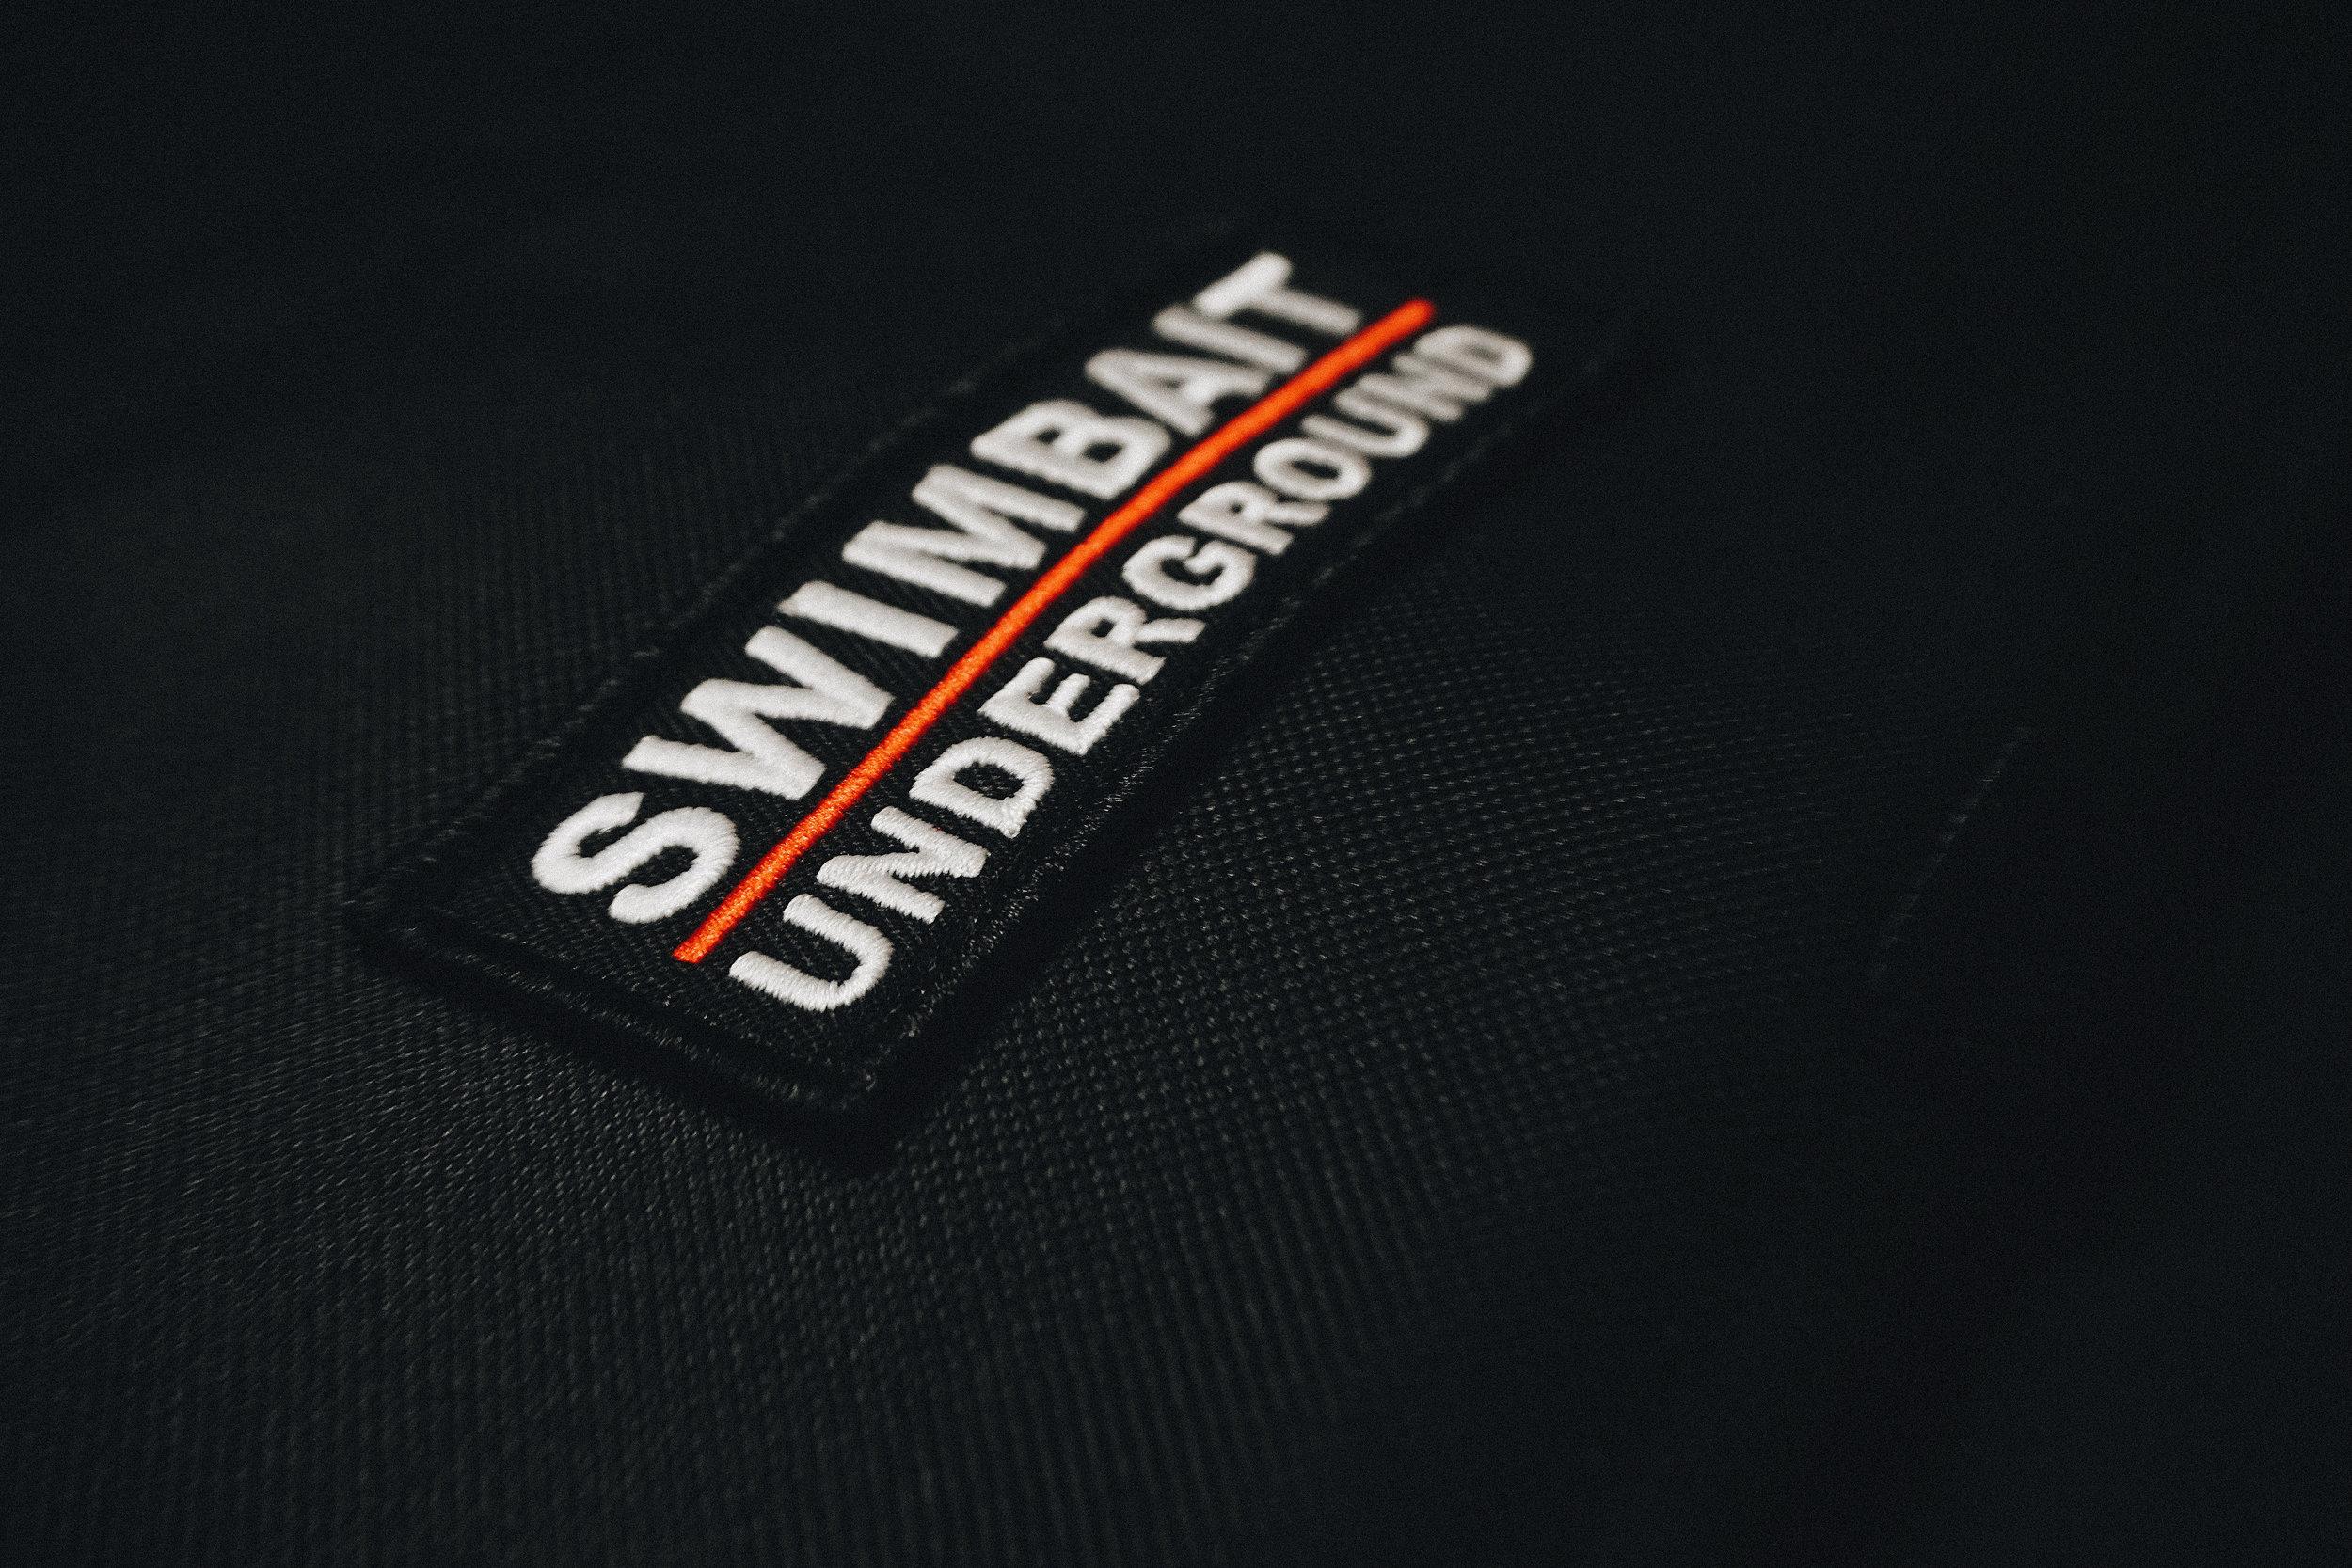 SBSRFC_Swimbait_Underground_DRT_Tiny_Klash_Collaboration_8.jpg